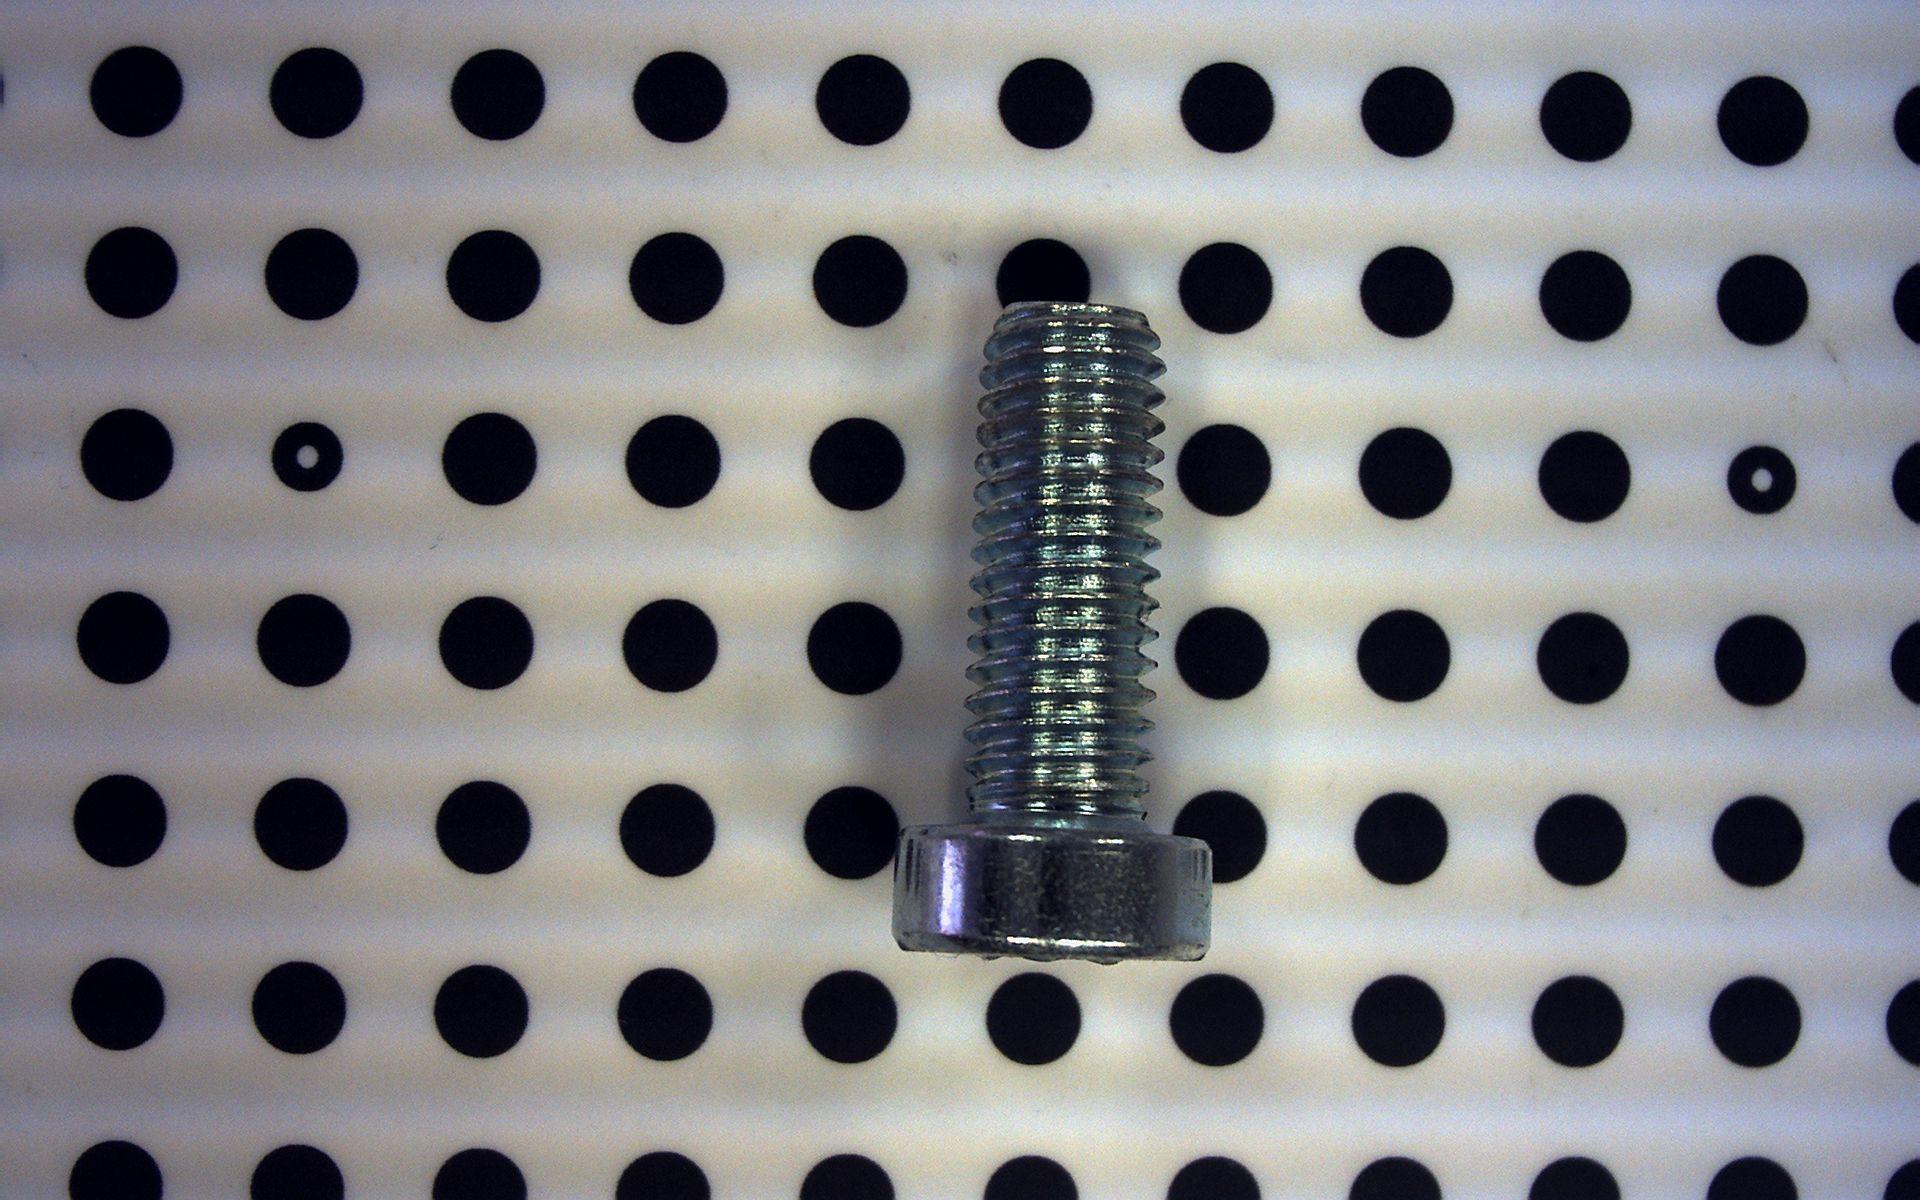 dfk-afux236-m12-svl-0625smac-91mm.jpg